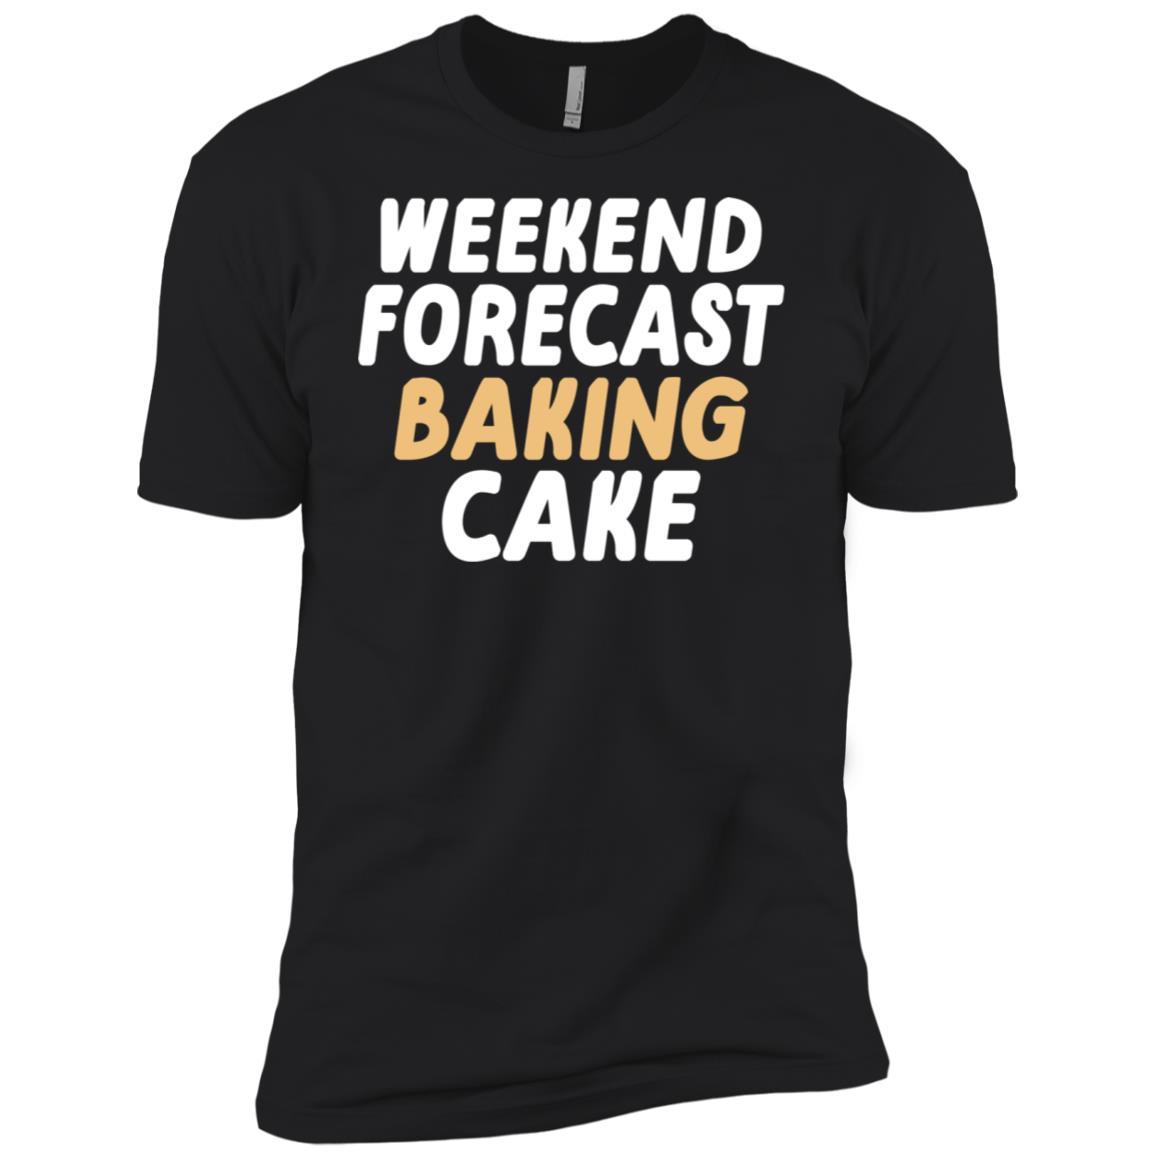 Weekend Forecast Baking Cake funny Men Short Sleeve T-Shirt